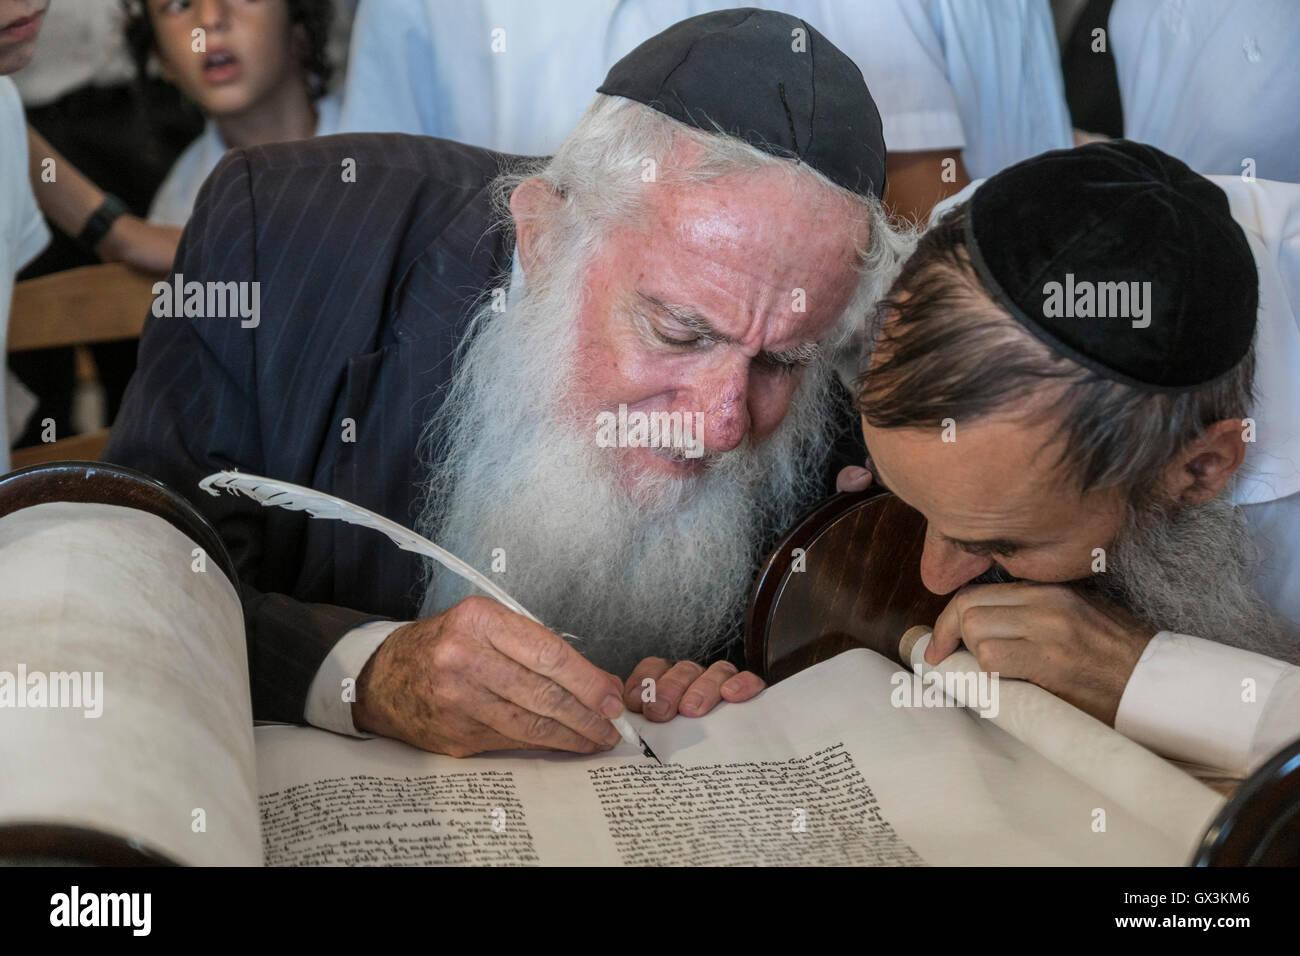 Neria, Israel. 15th September, 2016. A scrivener helps Rabbi Michael Hershkovits of the vilage of Neria to write - Stock Image